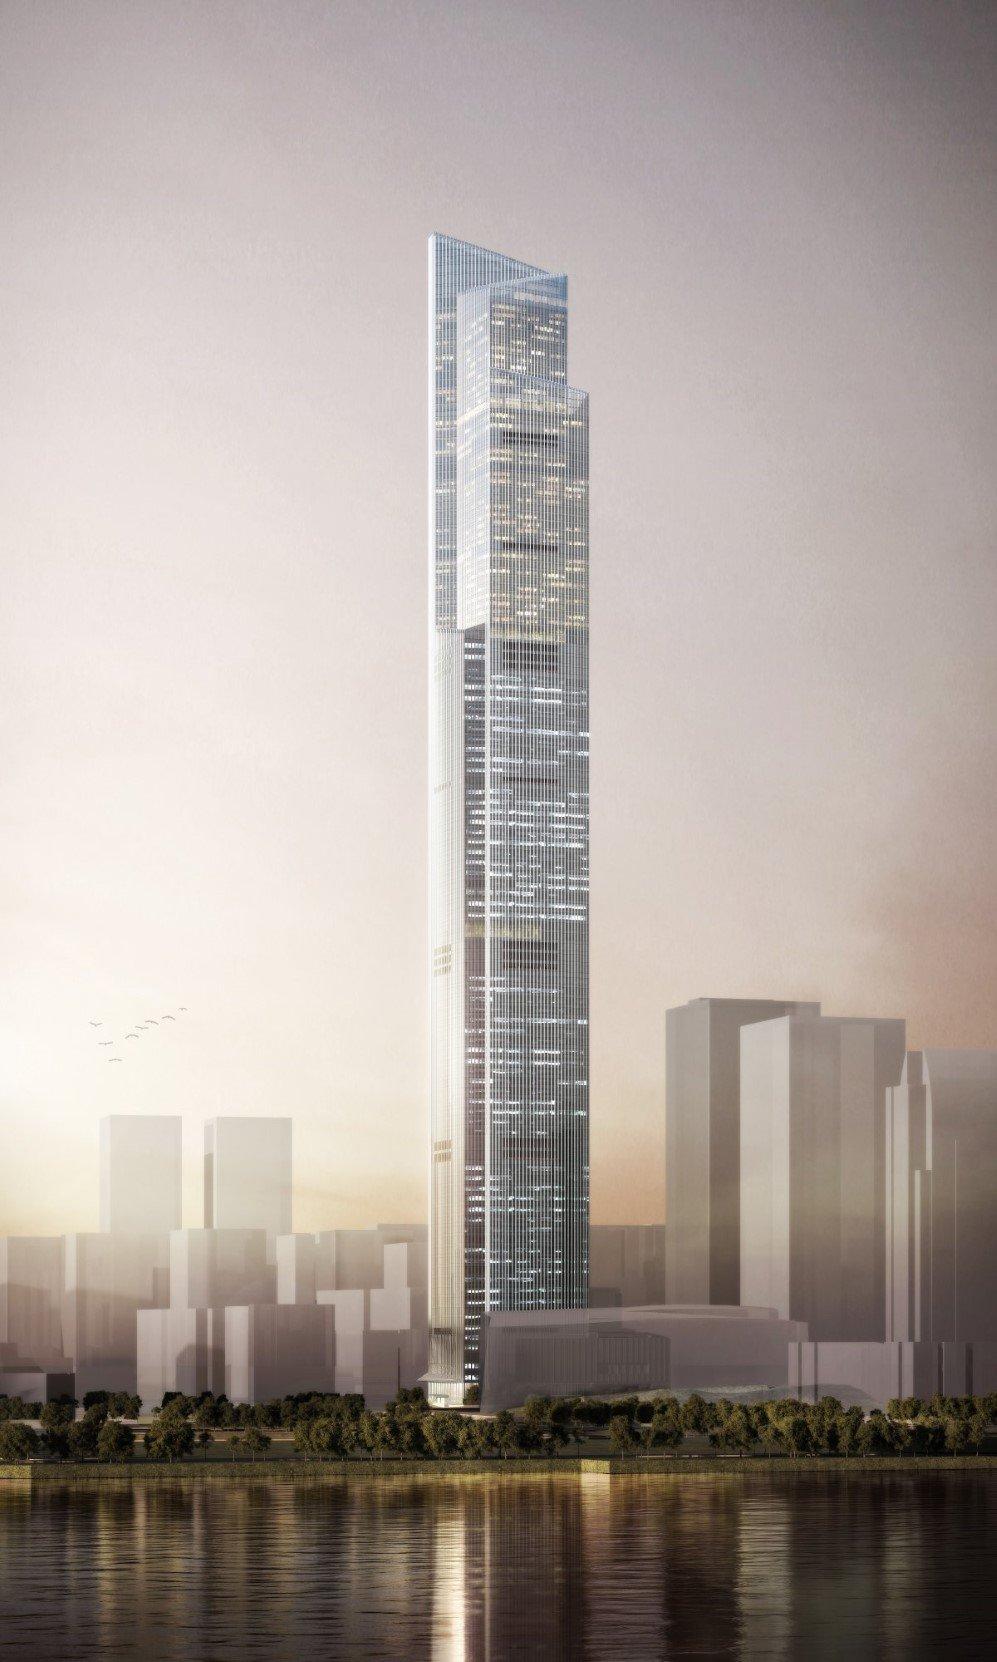 9. CTF Finance Center, Guangzhou, China